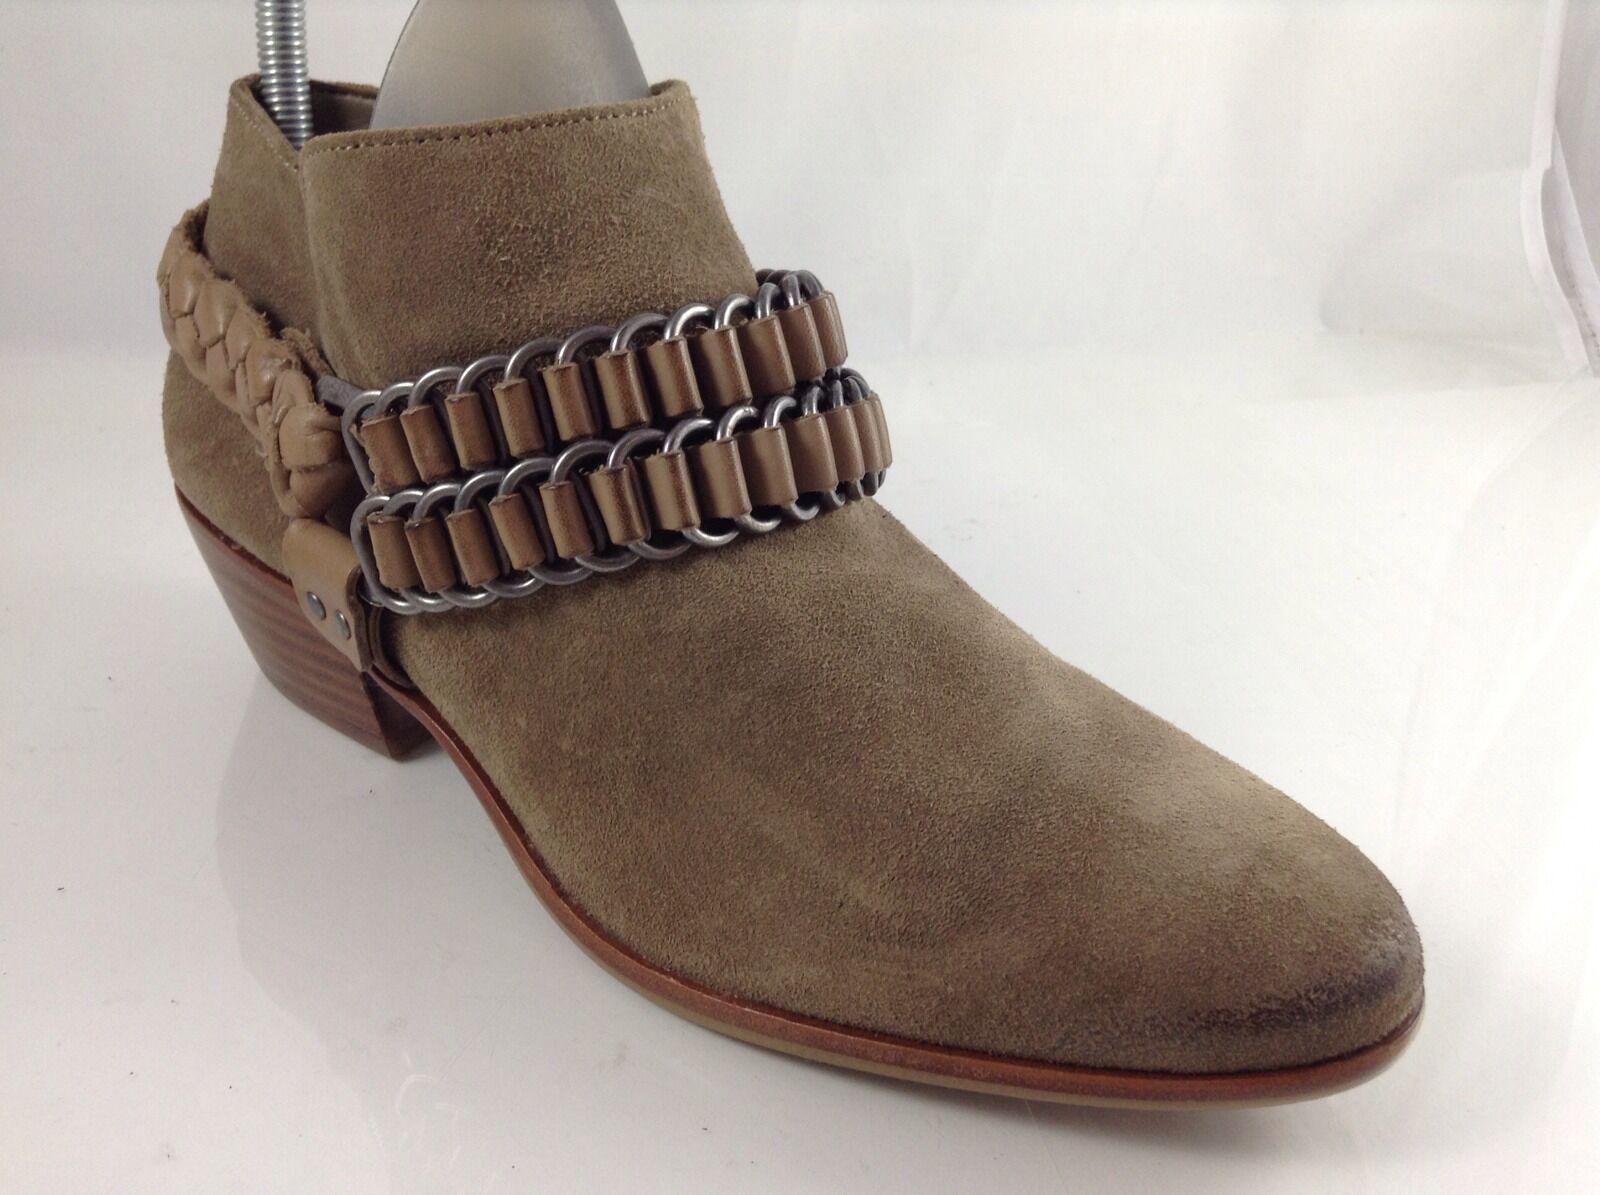 Sam Edelman Damenschuhe Beige Leder Ankle Stiefel 7.5 M